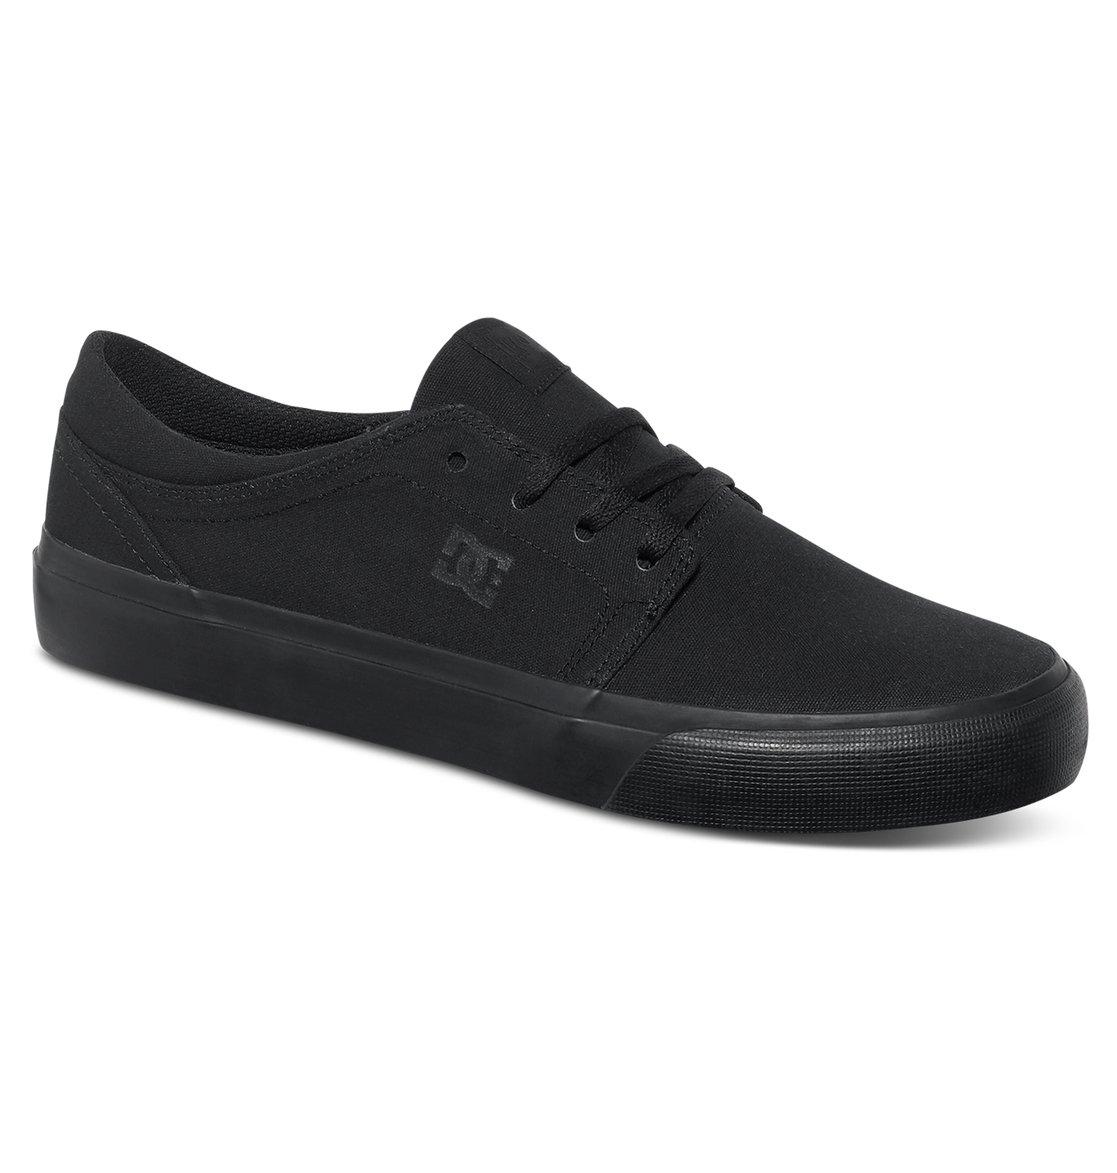 DC Trasé homme Slip-On Shoe T, EUR: 36, Charcoal Grey